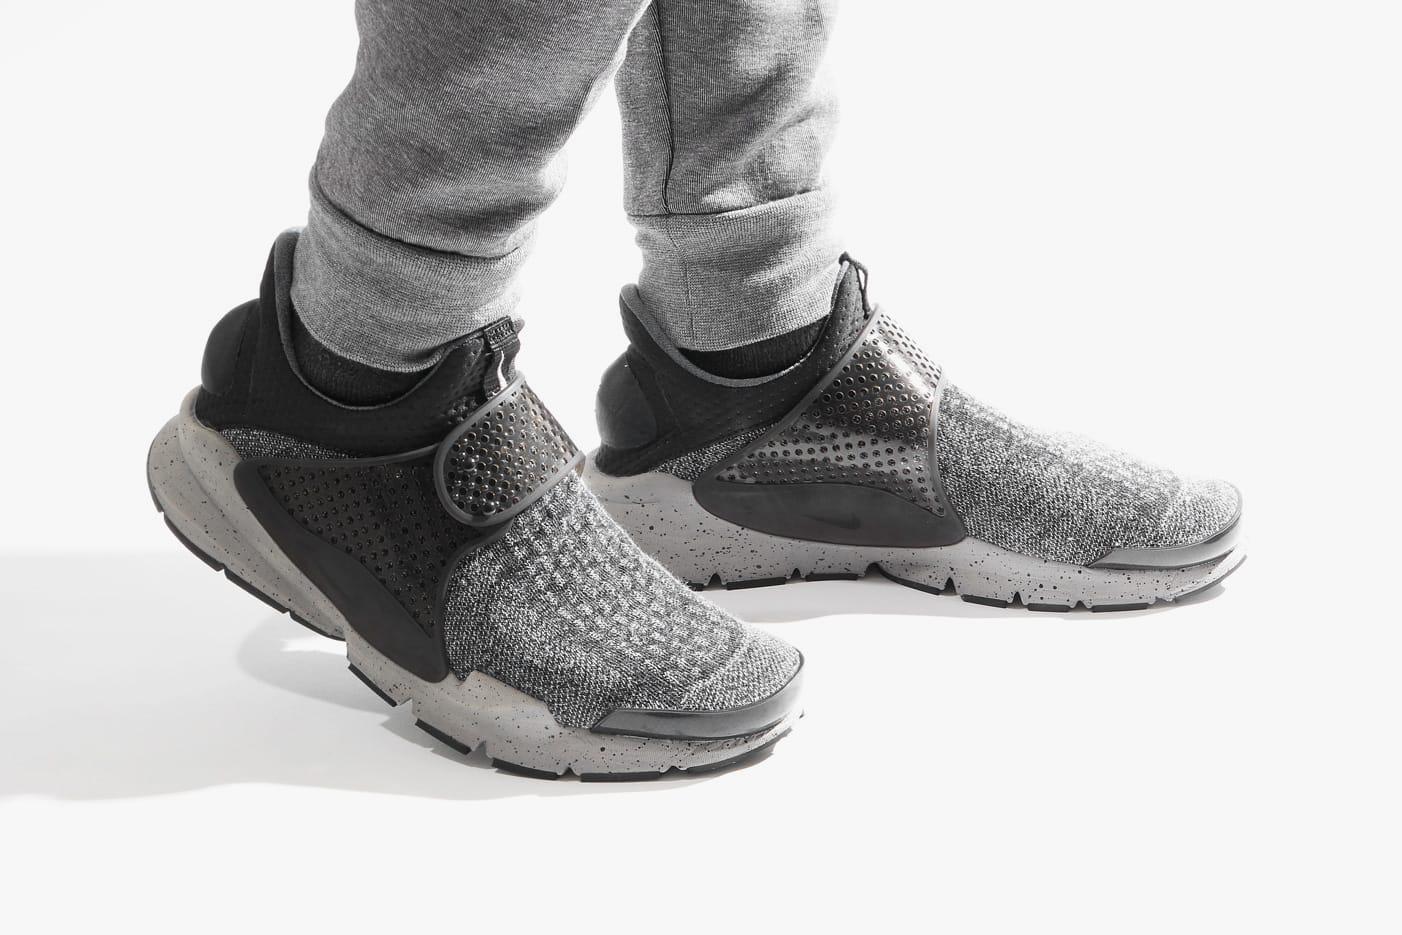 Nike Sock Dart Marled Gray Colorway